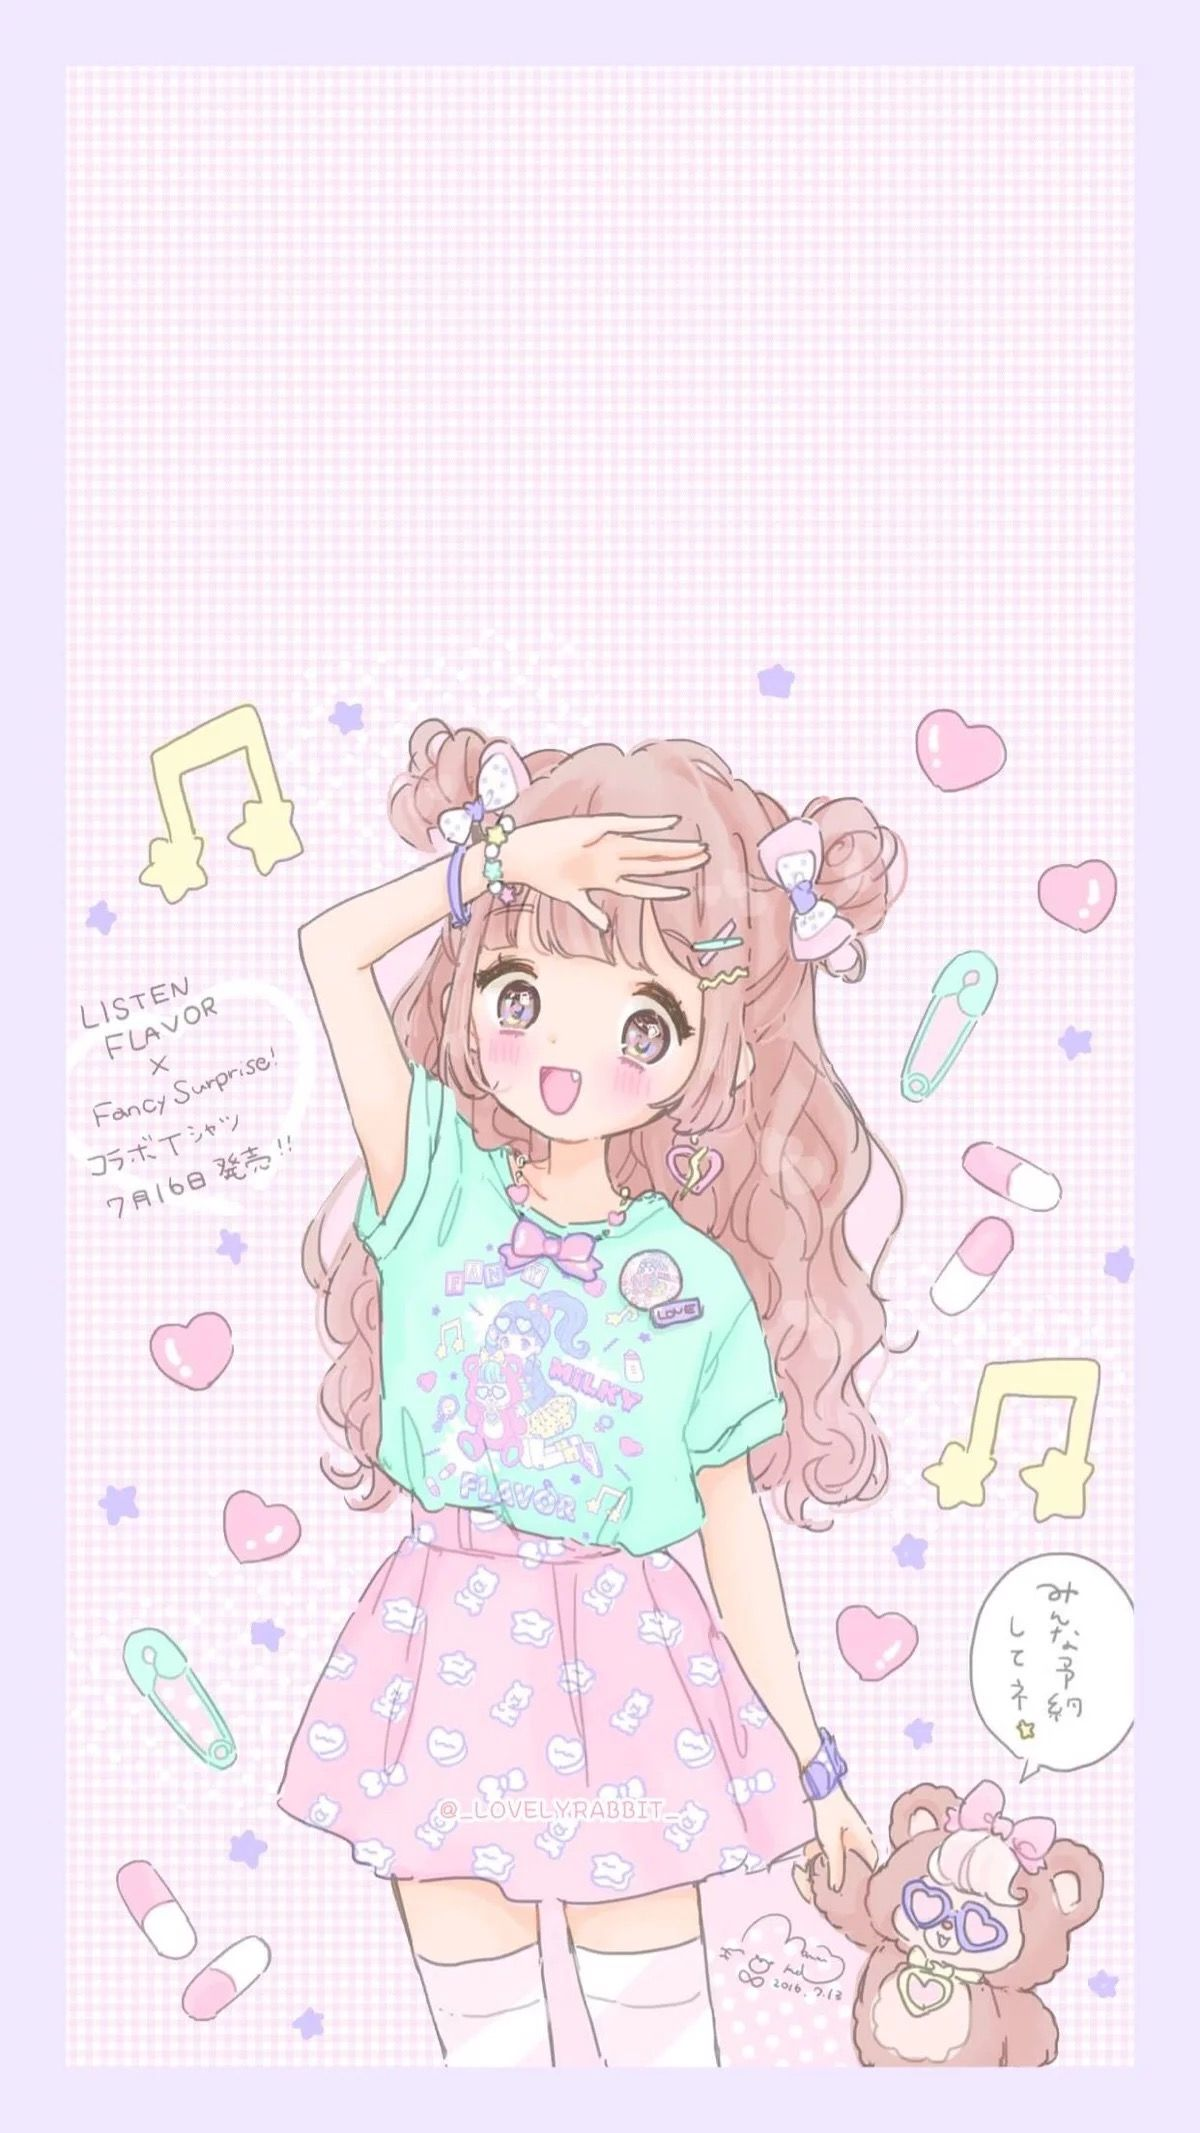 Kawaii Anime Wallpaper Posted By Ryan Johnson